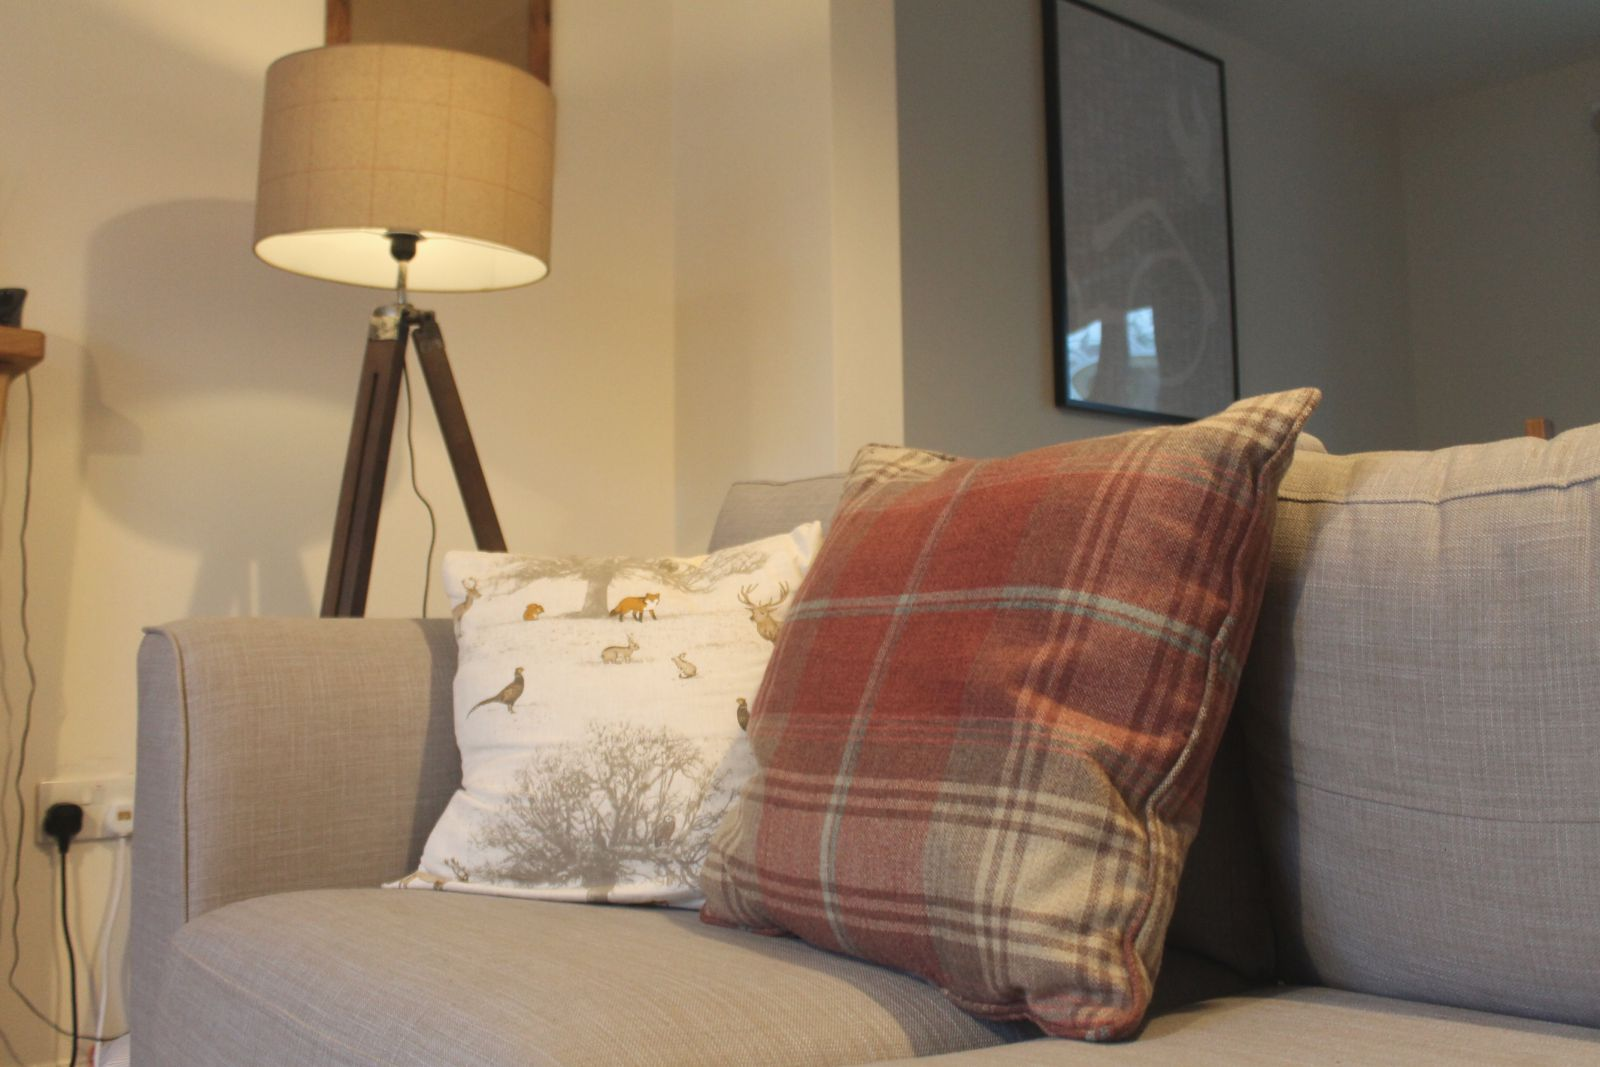 home details - cushions